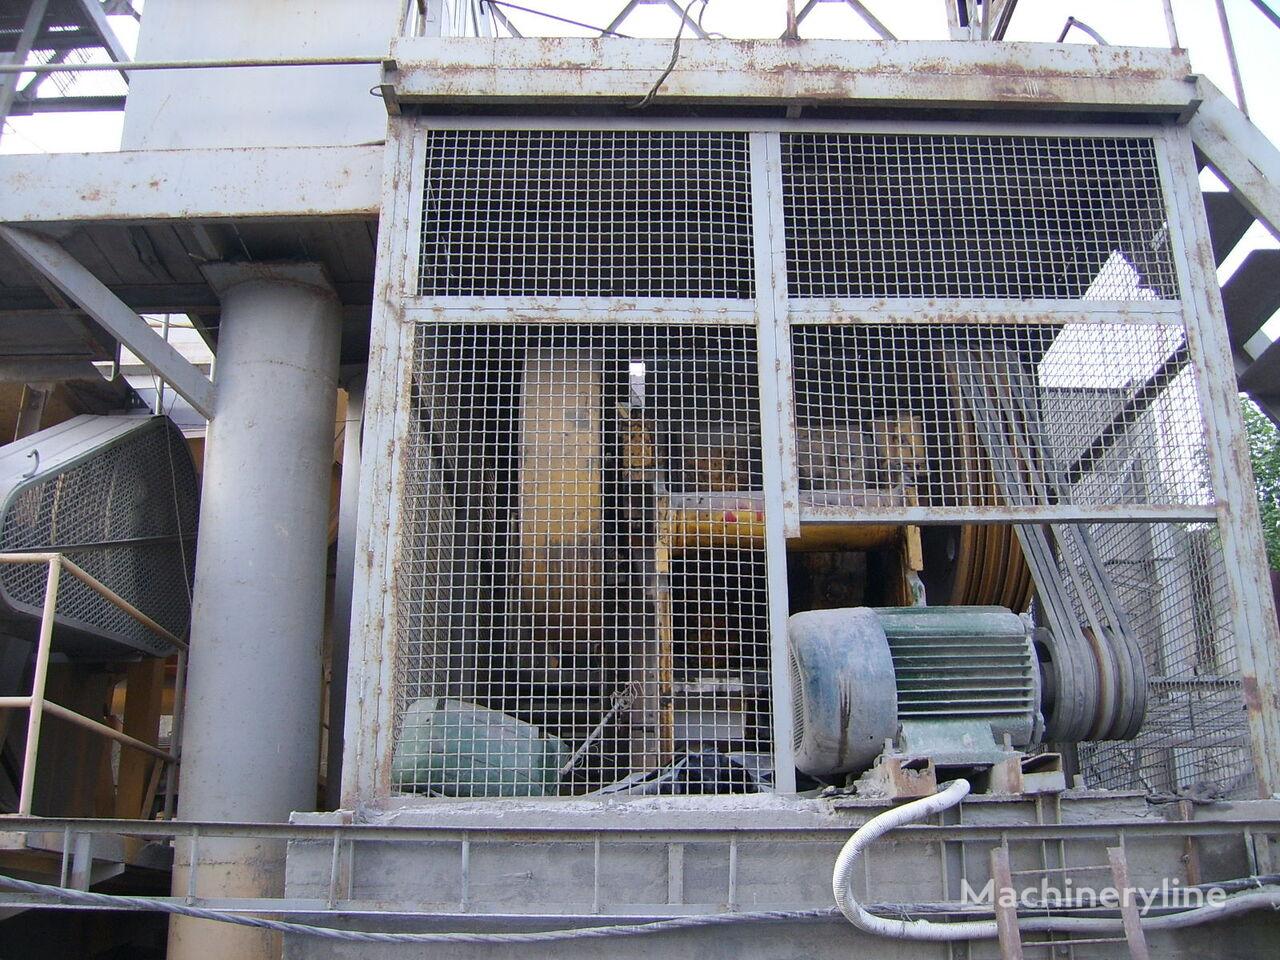 Shchokova drobilka SMD 110 planta trituradora